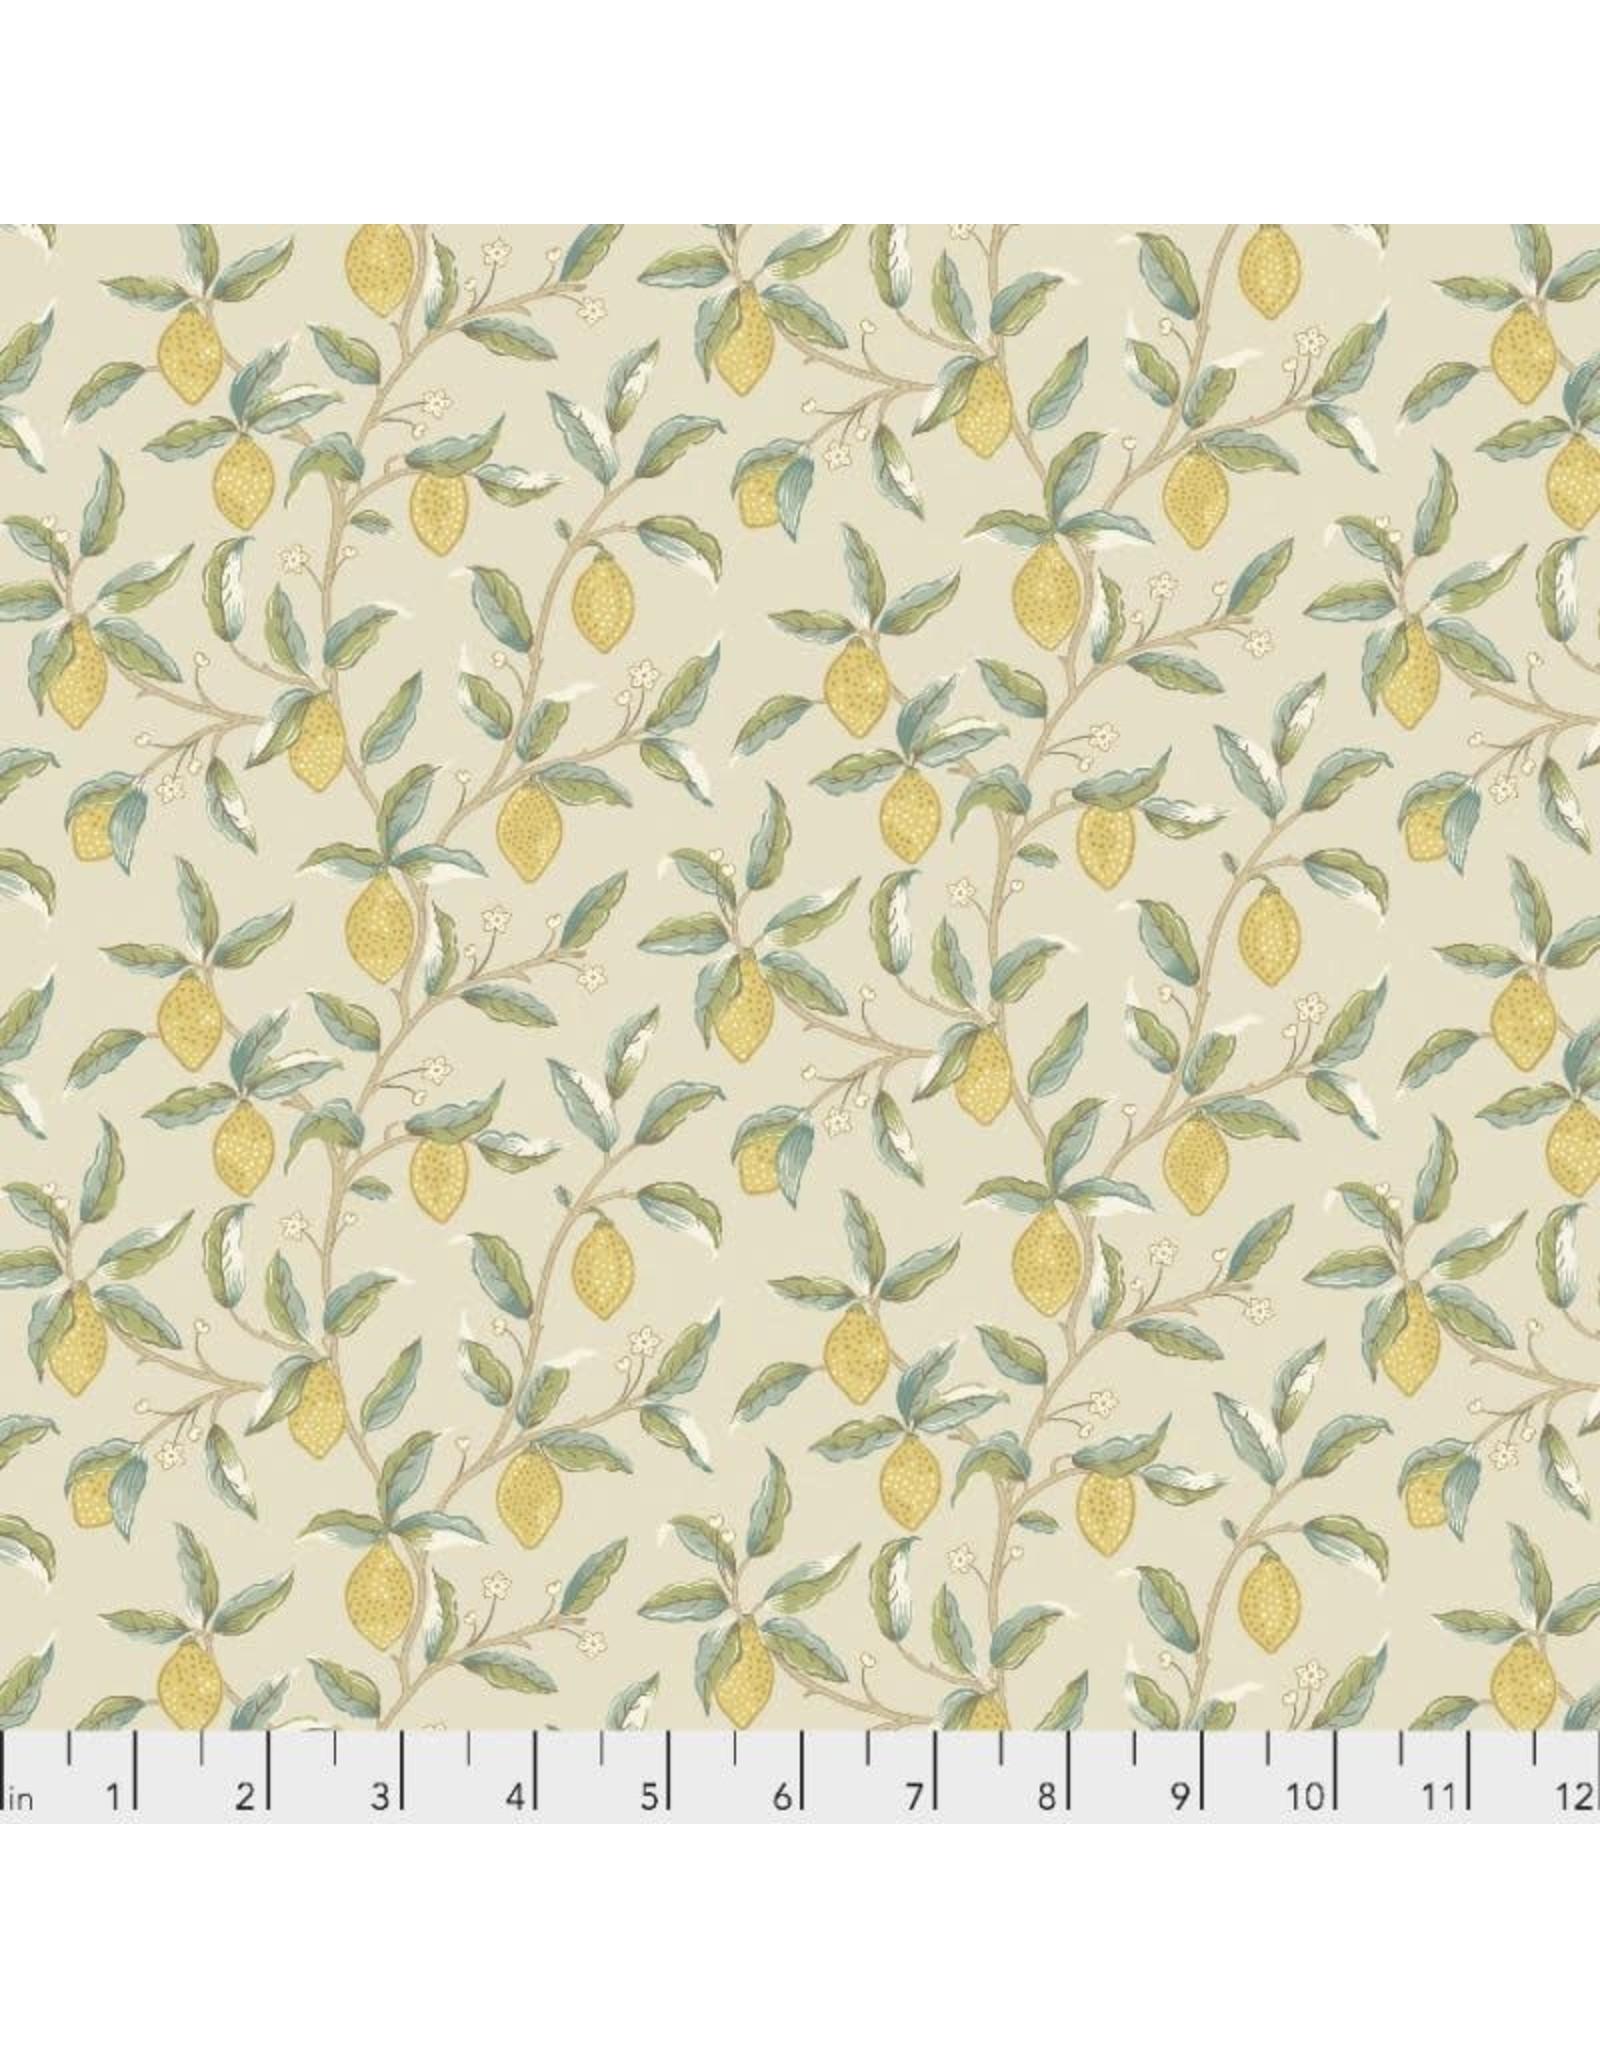 PD's William Morris Collection Orkney, Lemon Tree in Linen, Dinner Napkin